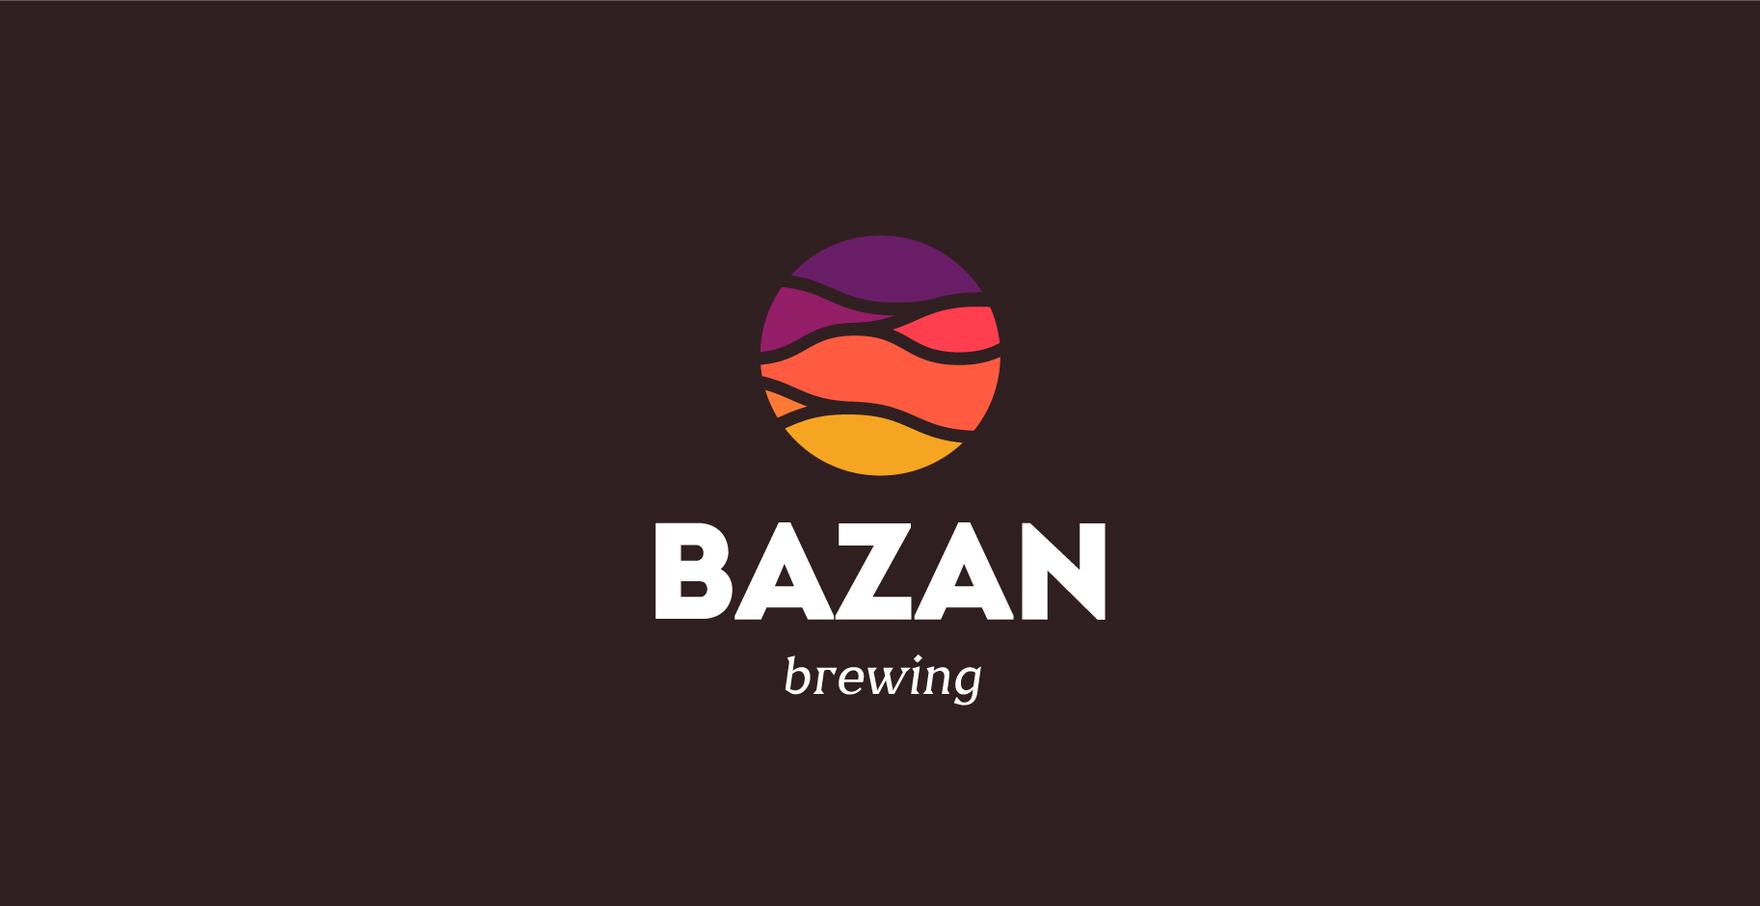 bazan-logo.png